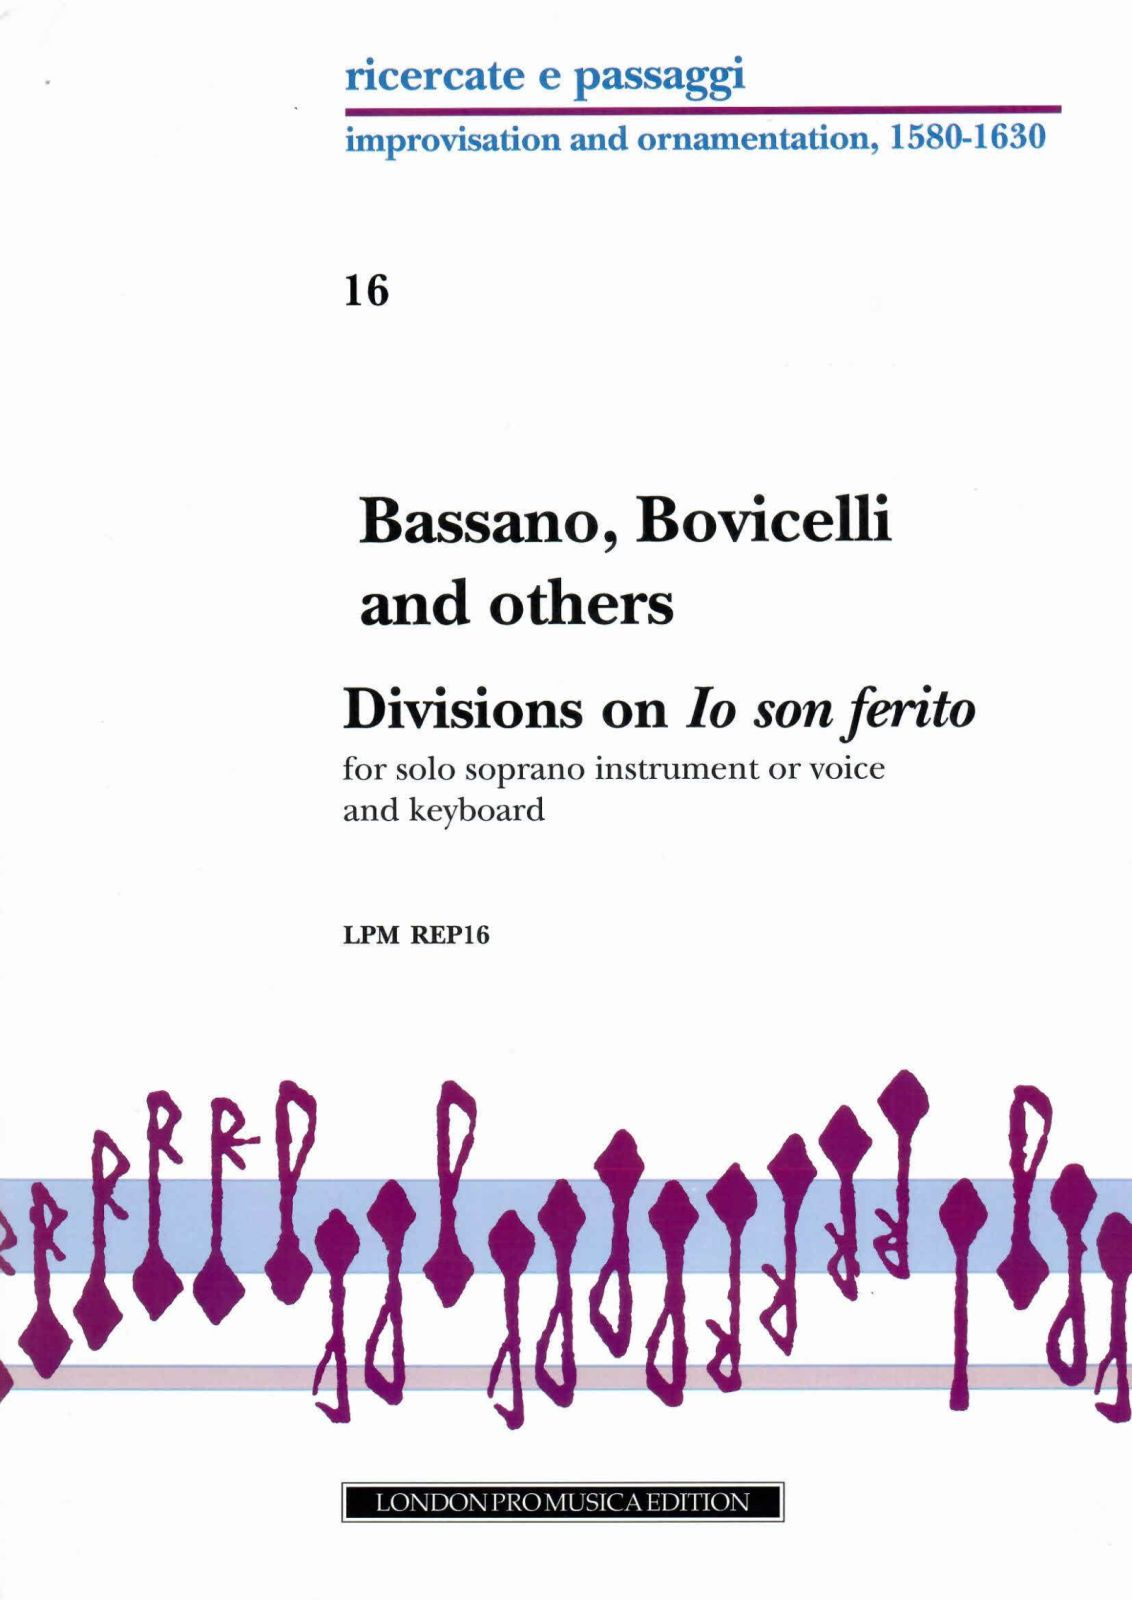 Bassano, Bovicelli And Others - Divisions On Io Son Ferrito Ahi Lasso - Dessus(voix) Et Bc